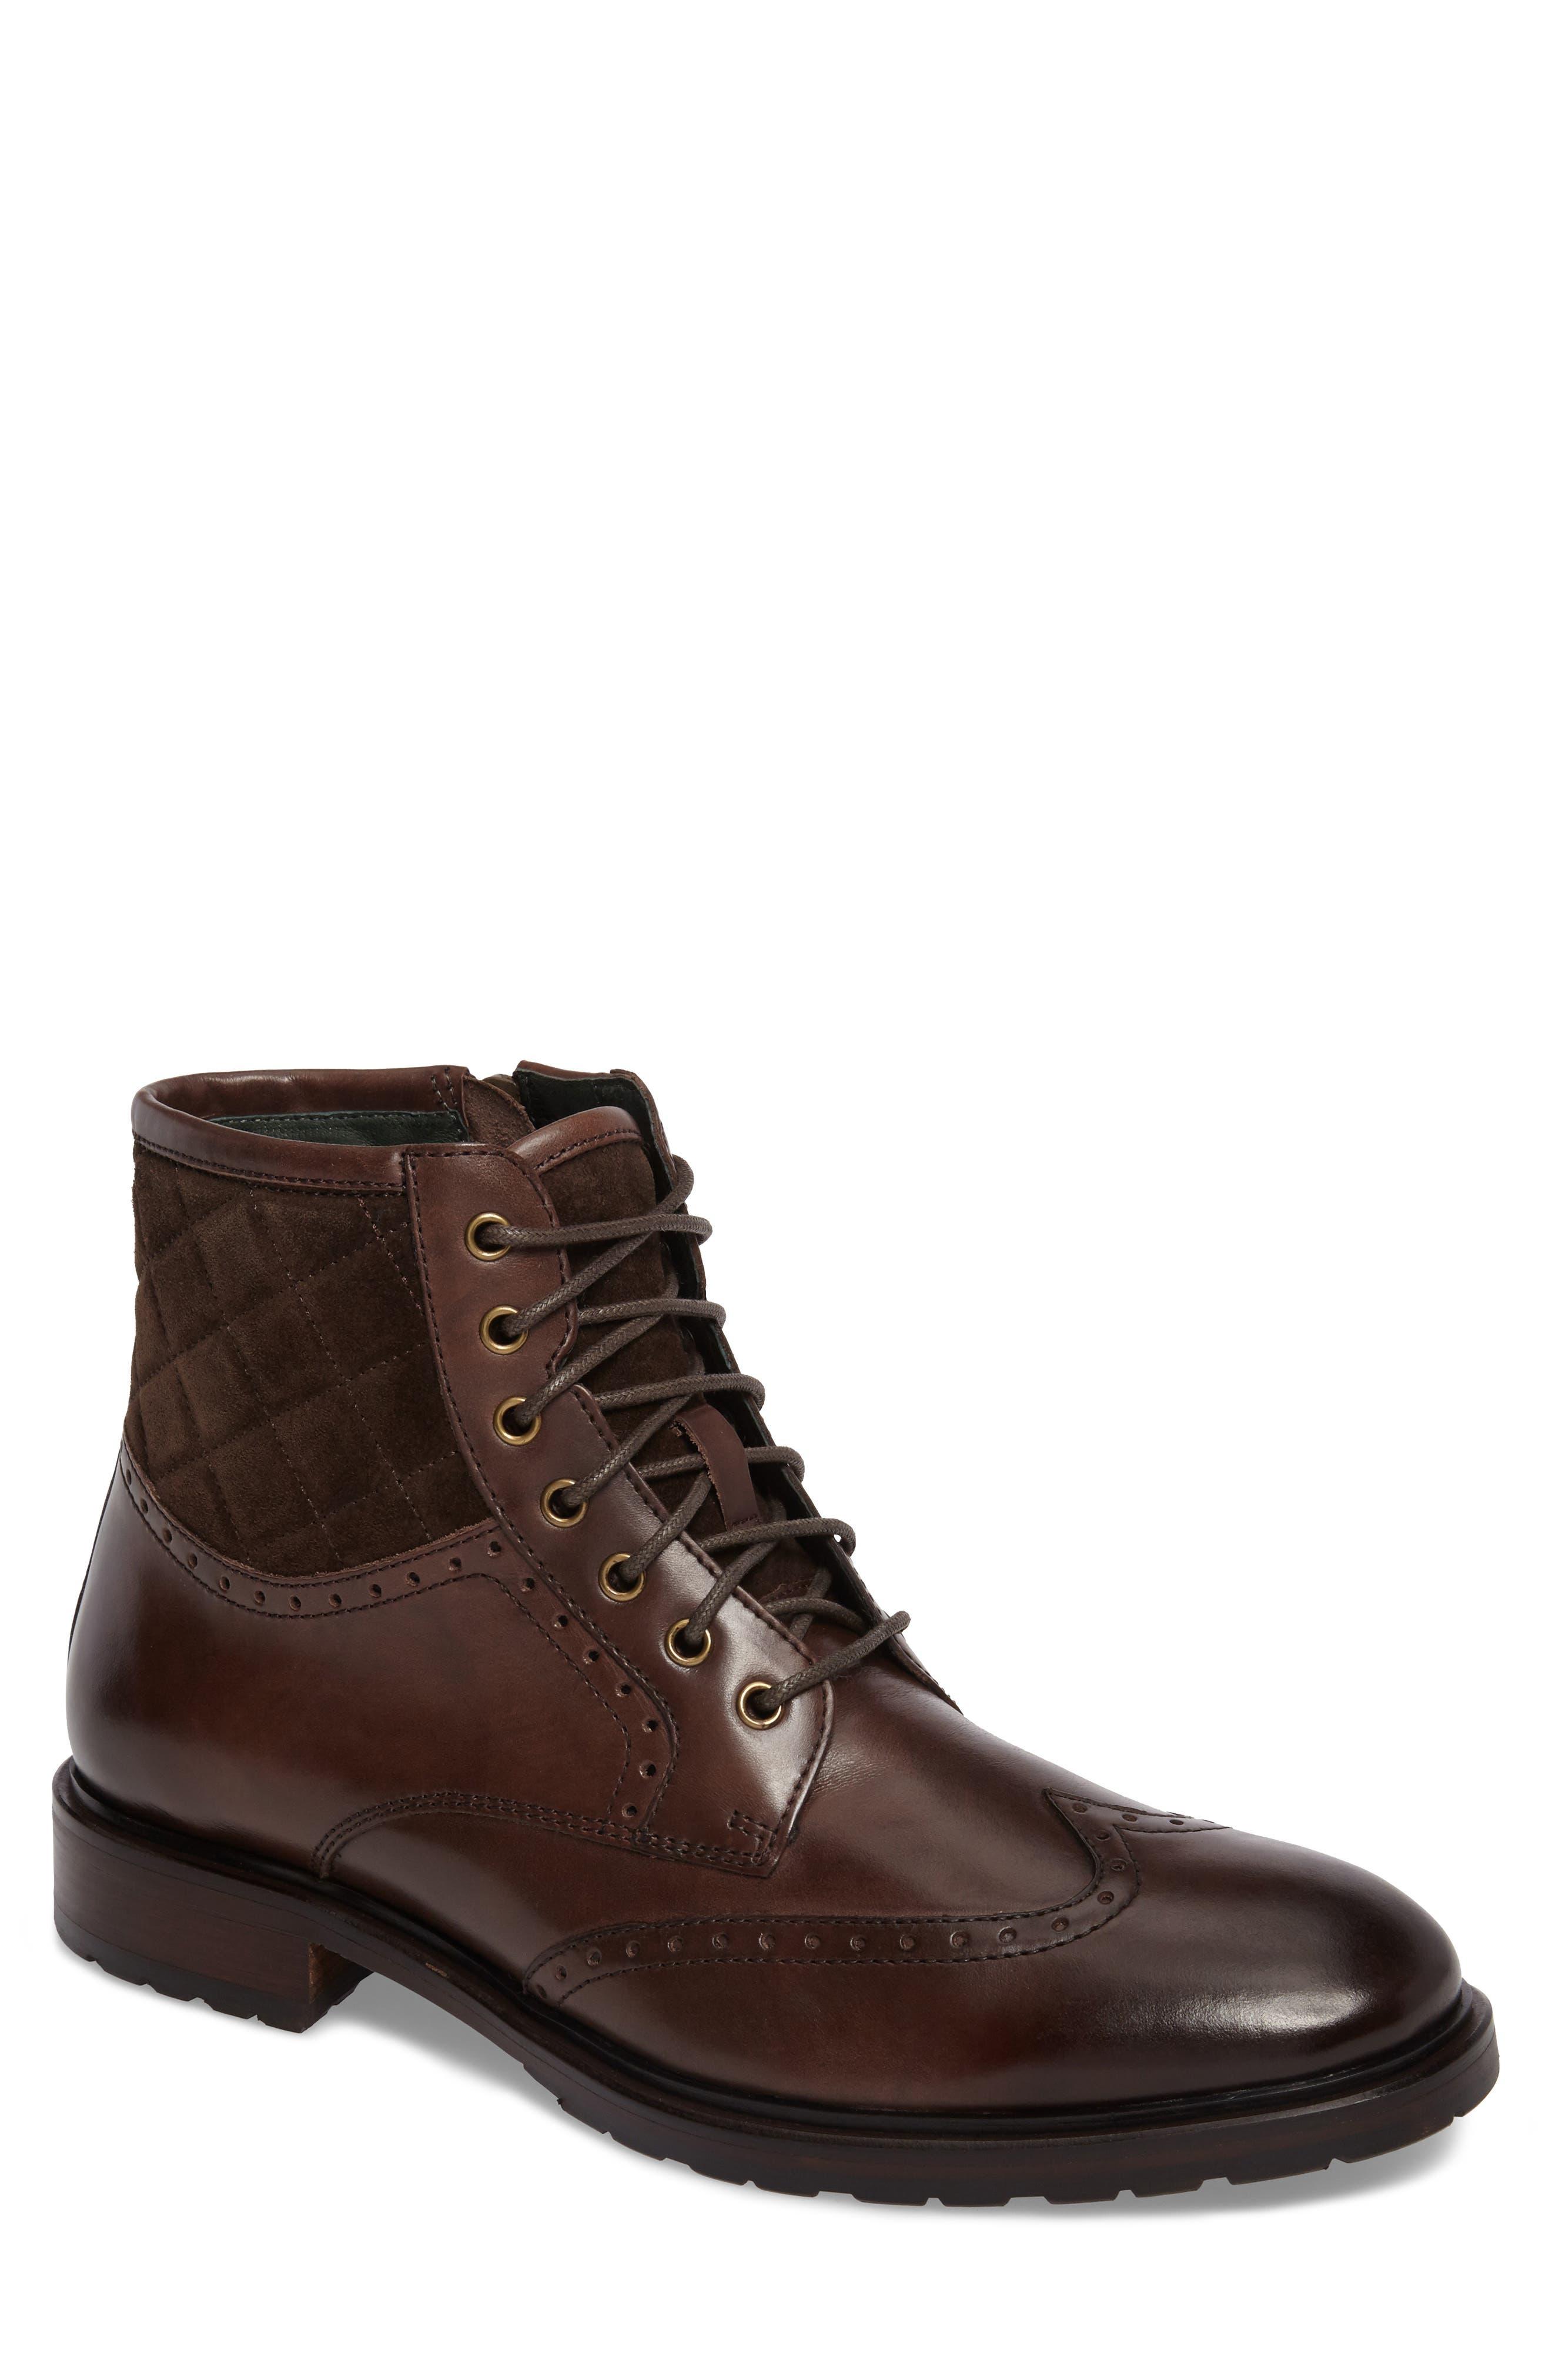 Myles Wingtip Boot,                             Main thumbnail 1, color,                             Mahogany Leather